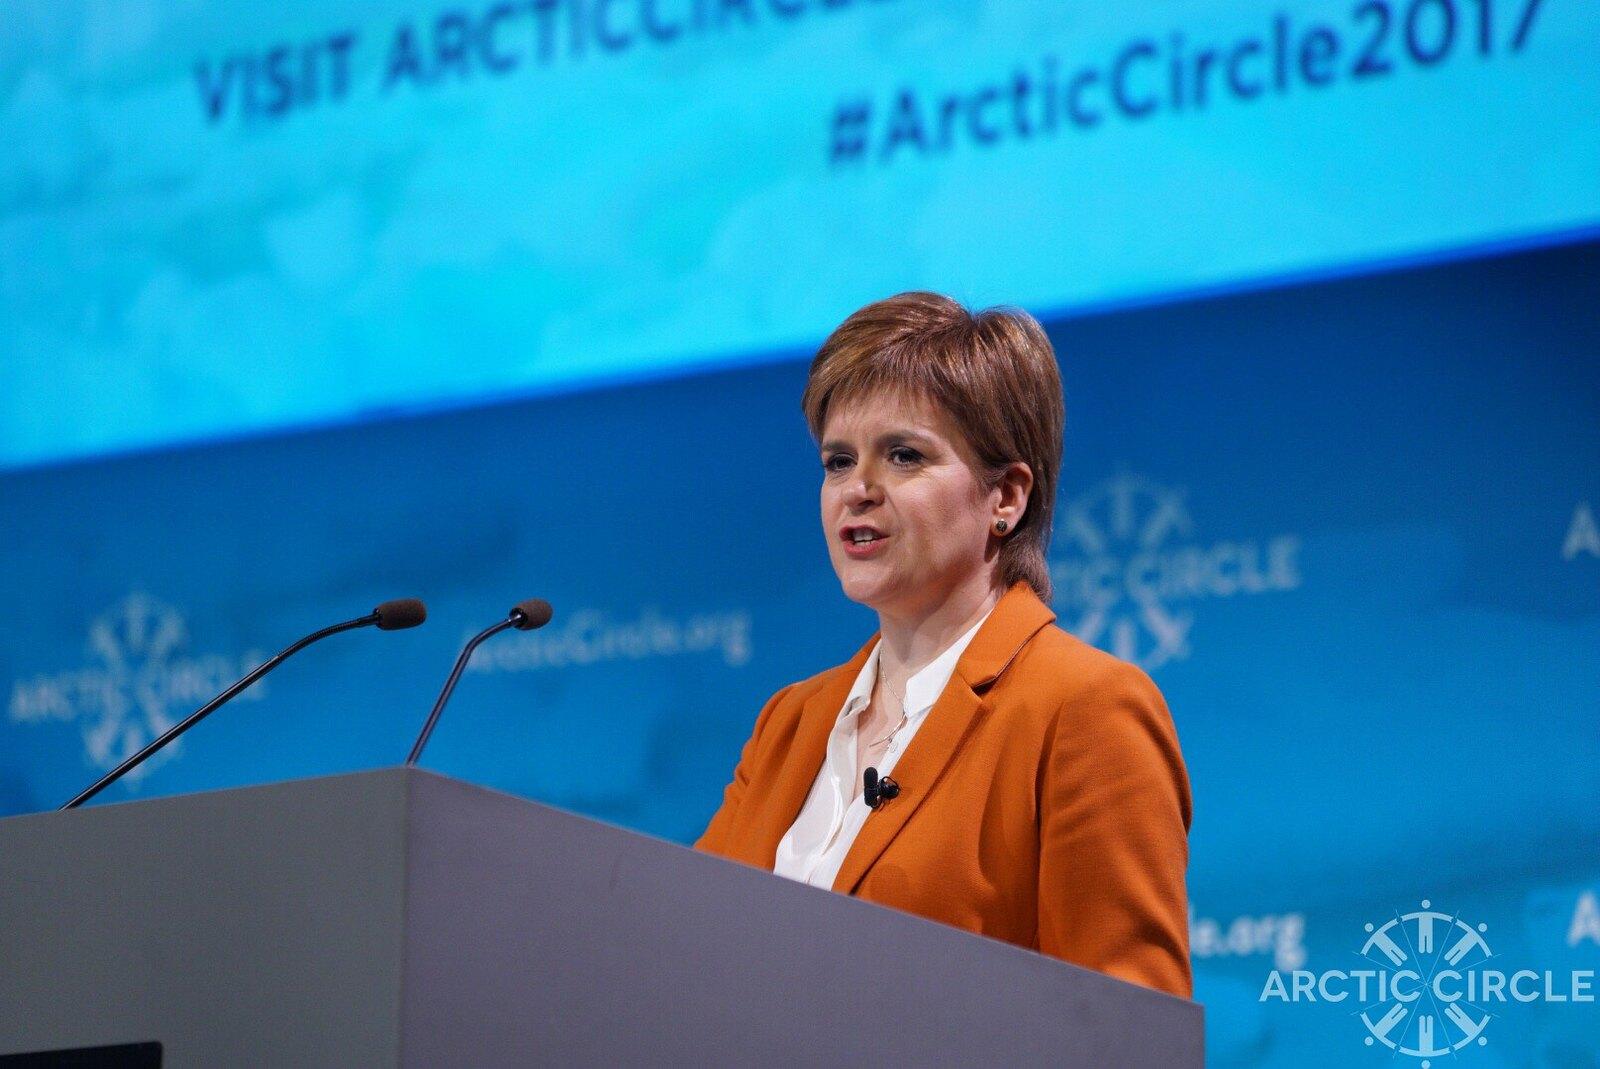 Image: Arctic Circle.